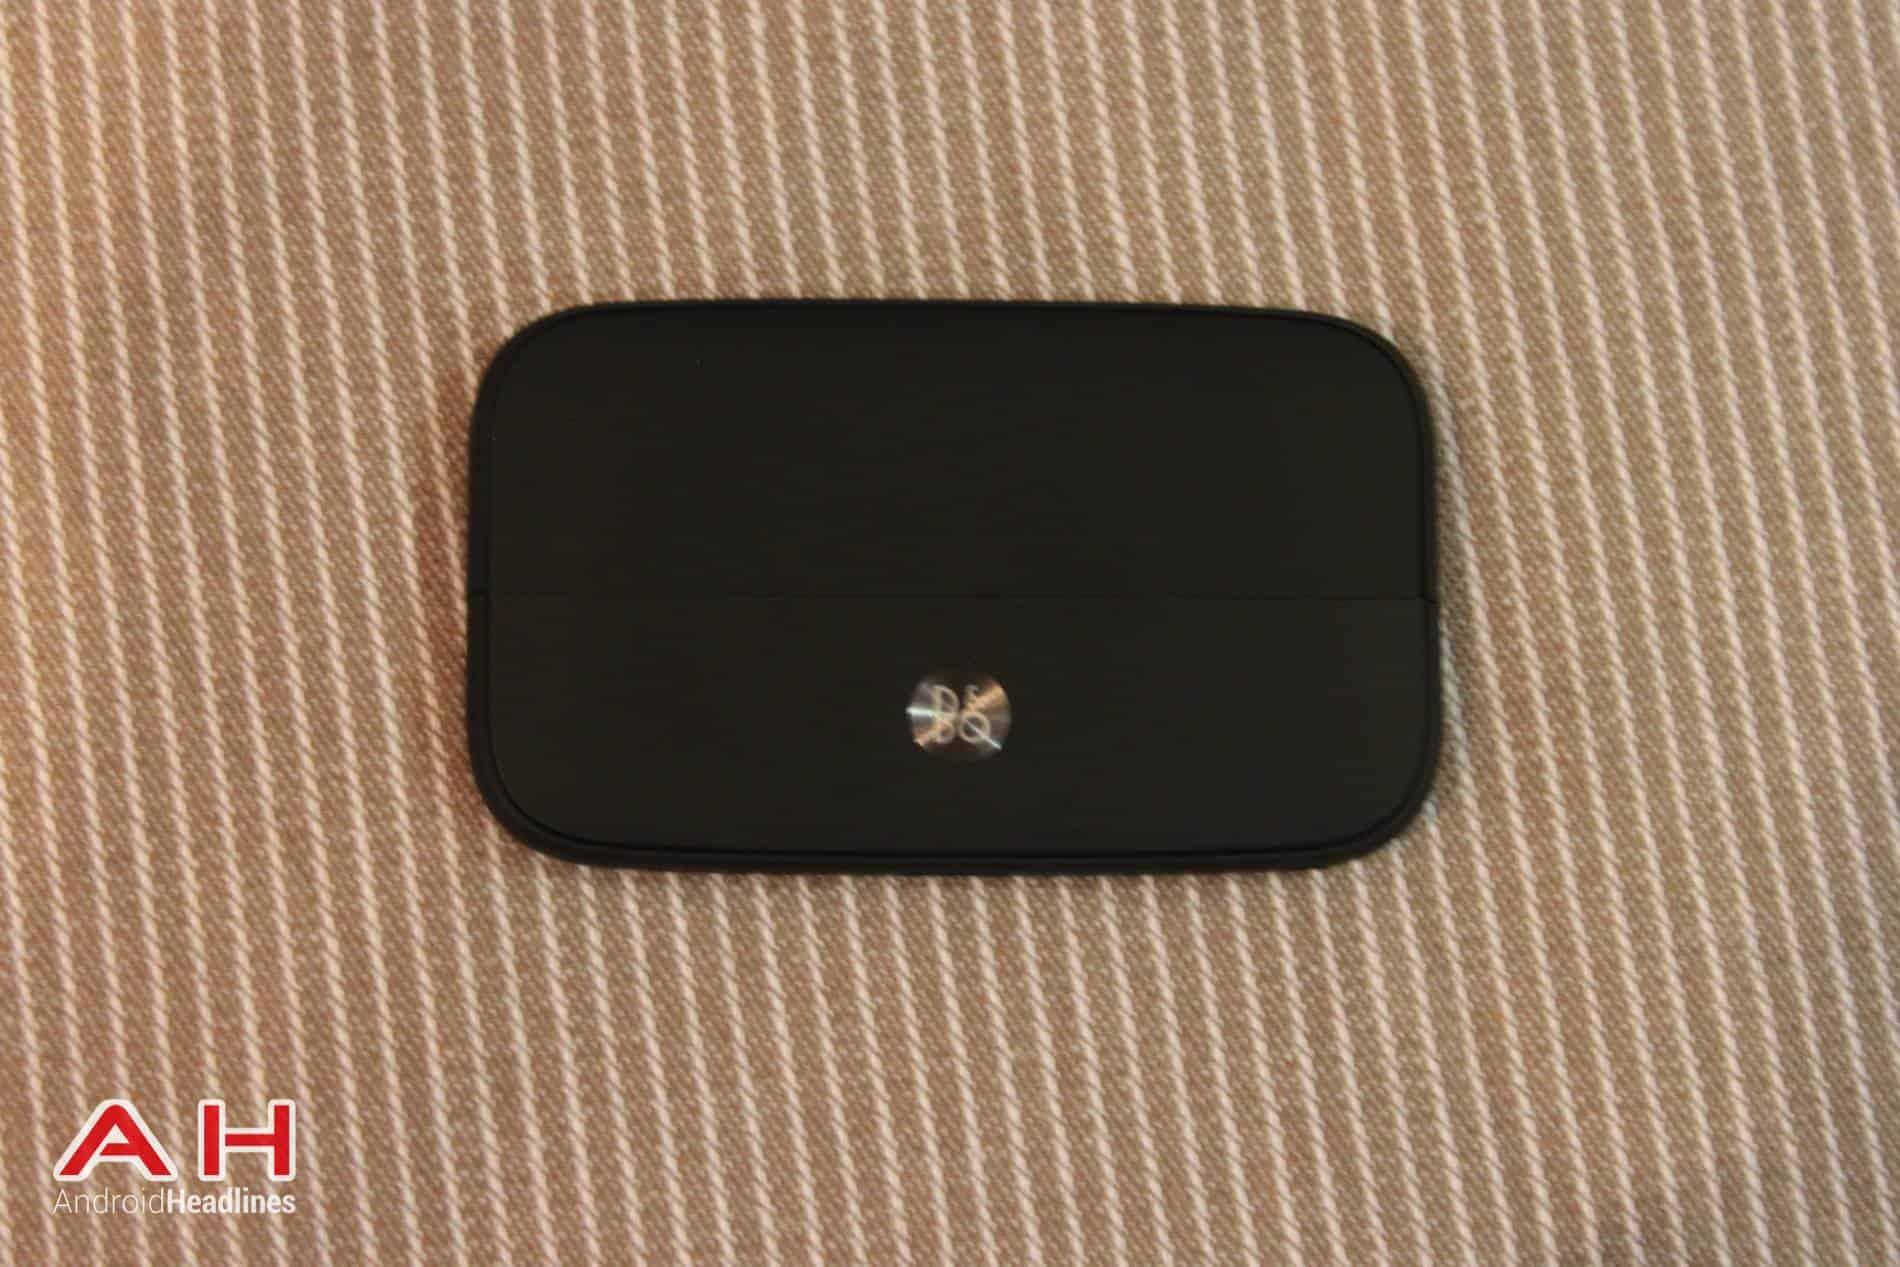 LG G5 BO DAC Magic Slot AH 01